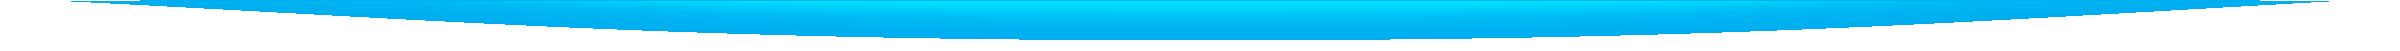 Snowball Slot Page Desktop Divider